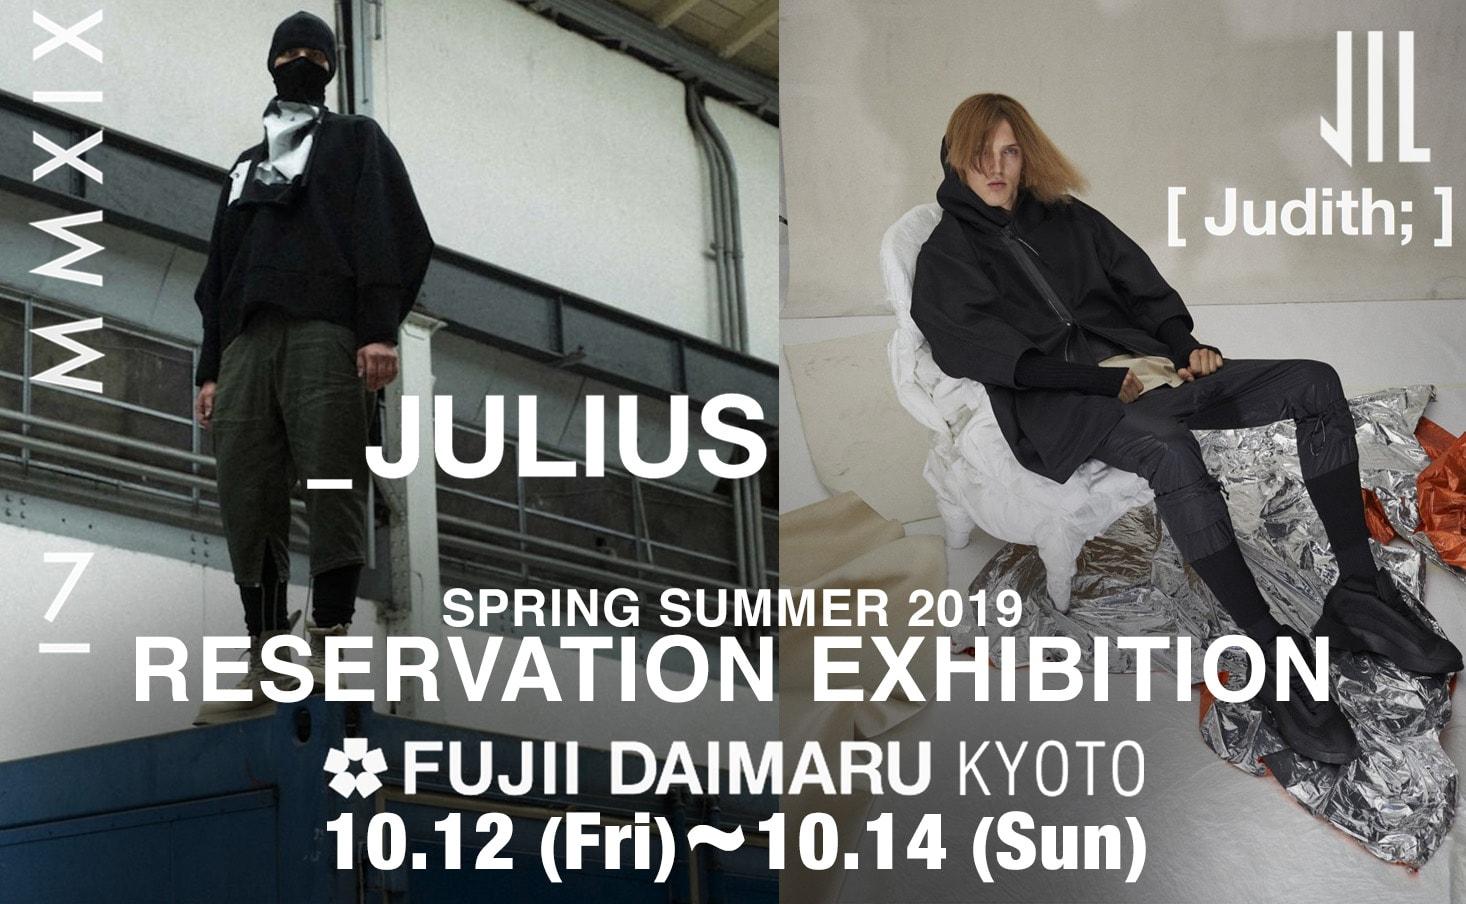 JULIUS & NILøS 19SS Reservation Exhibition at Kyoto Fujii Daimaru